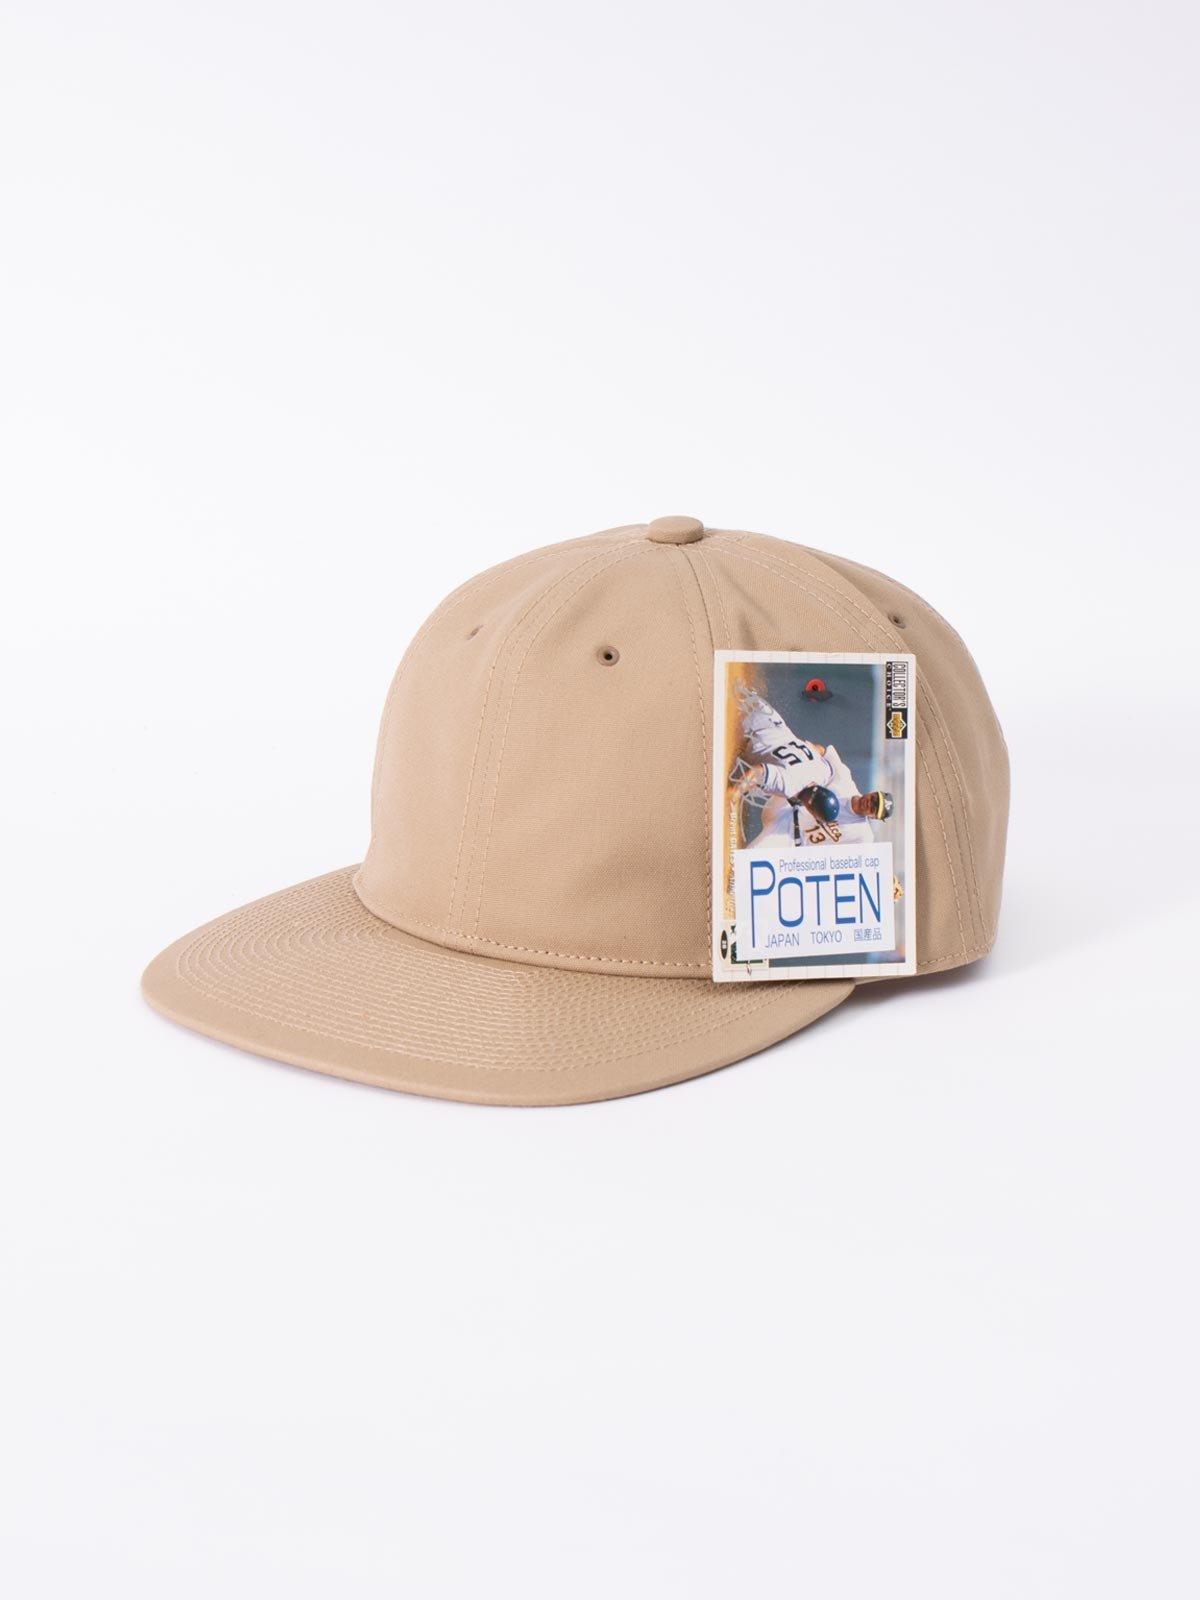 BEIGE FUJI KINBAI CAP - Image 1